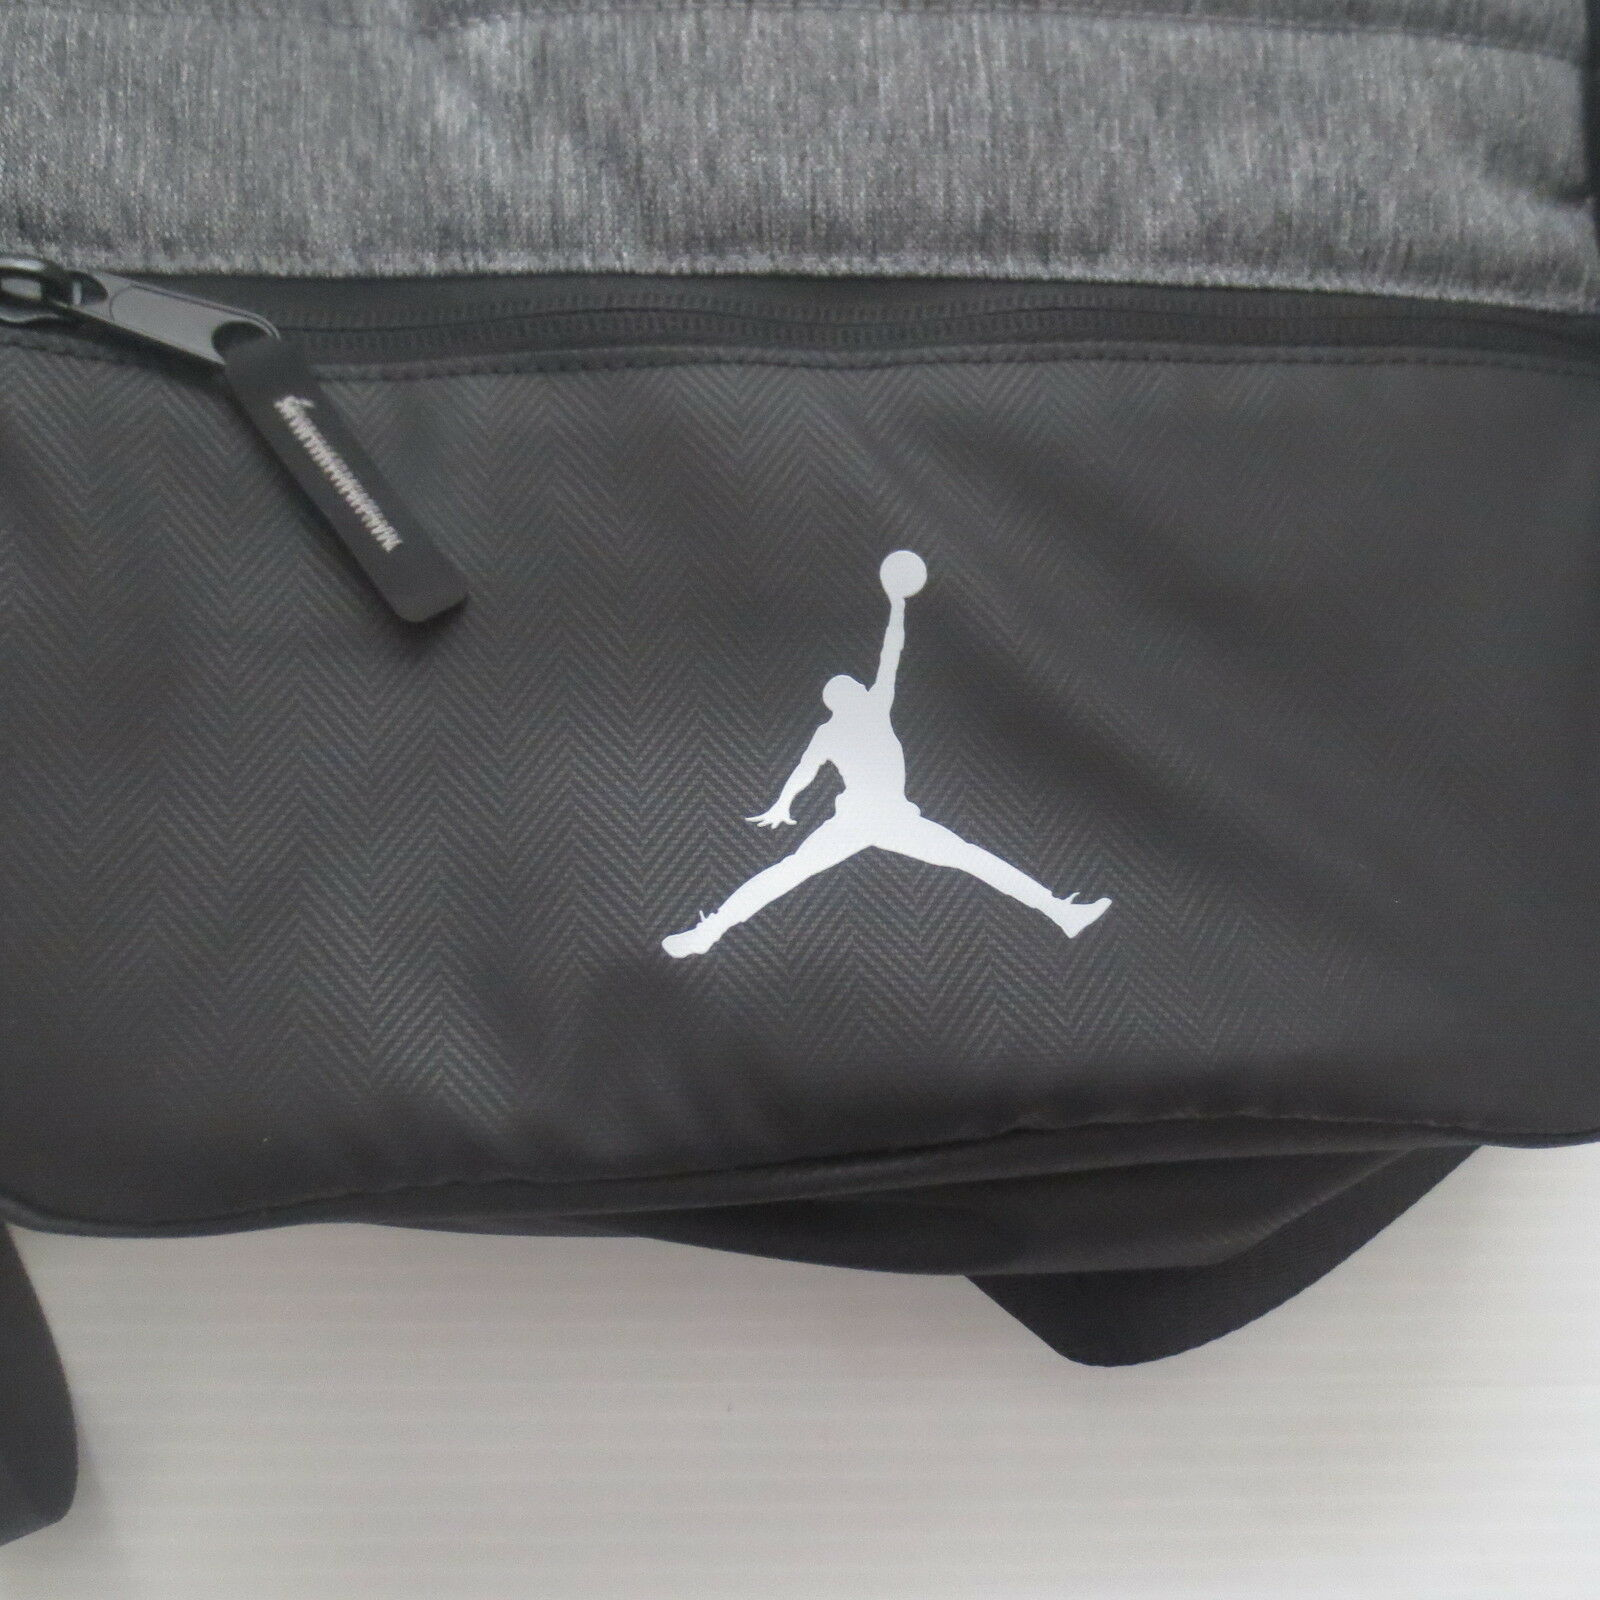 Nike Jordan Airborne Backpack - 9A1944 - Gray - NWT image 2